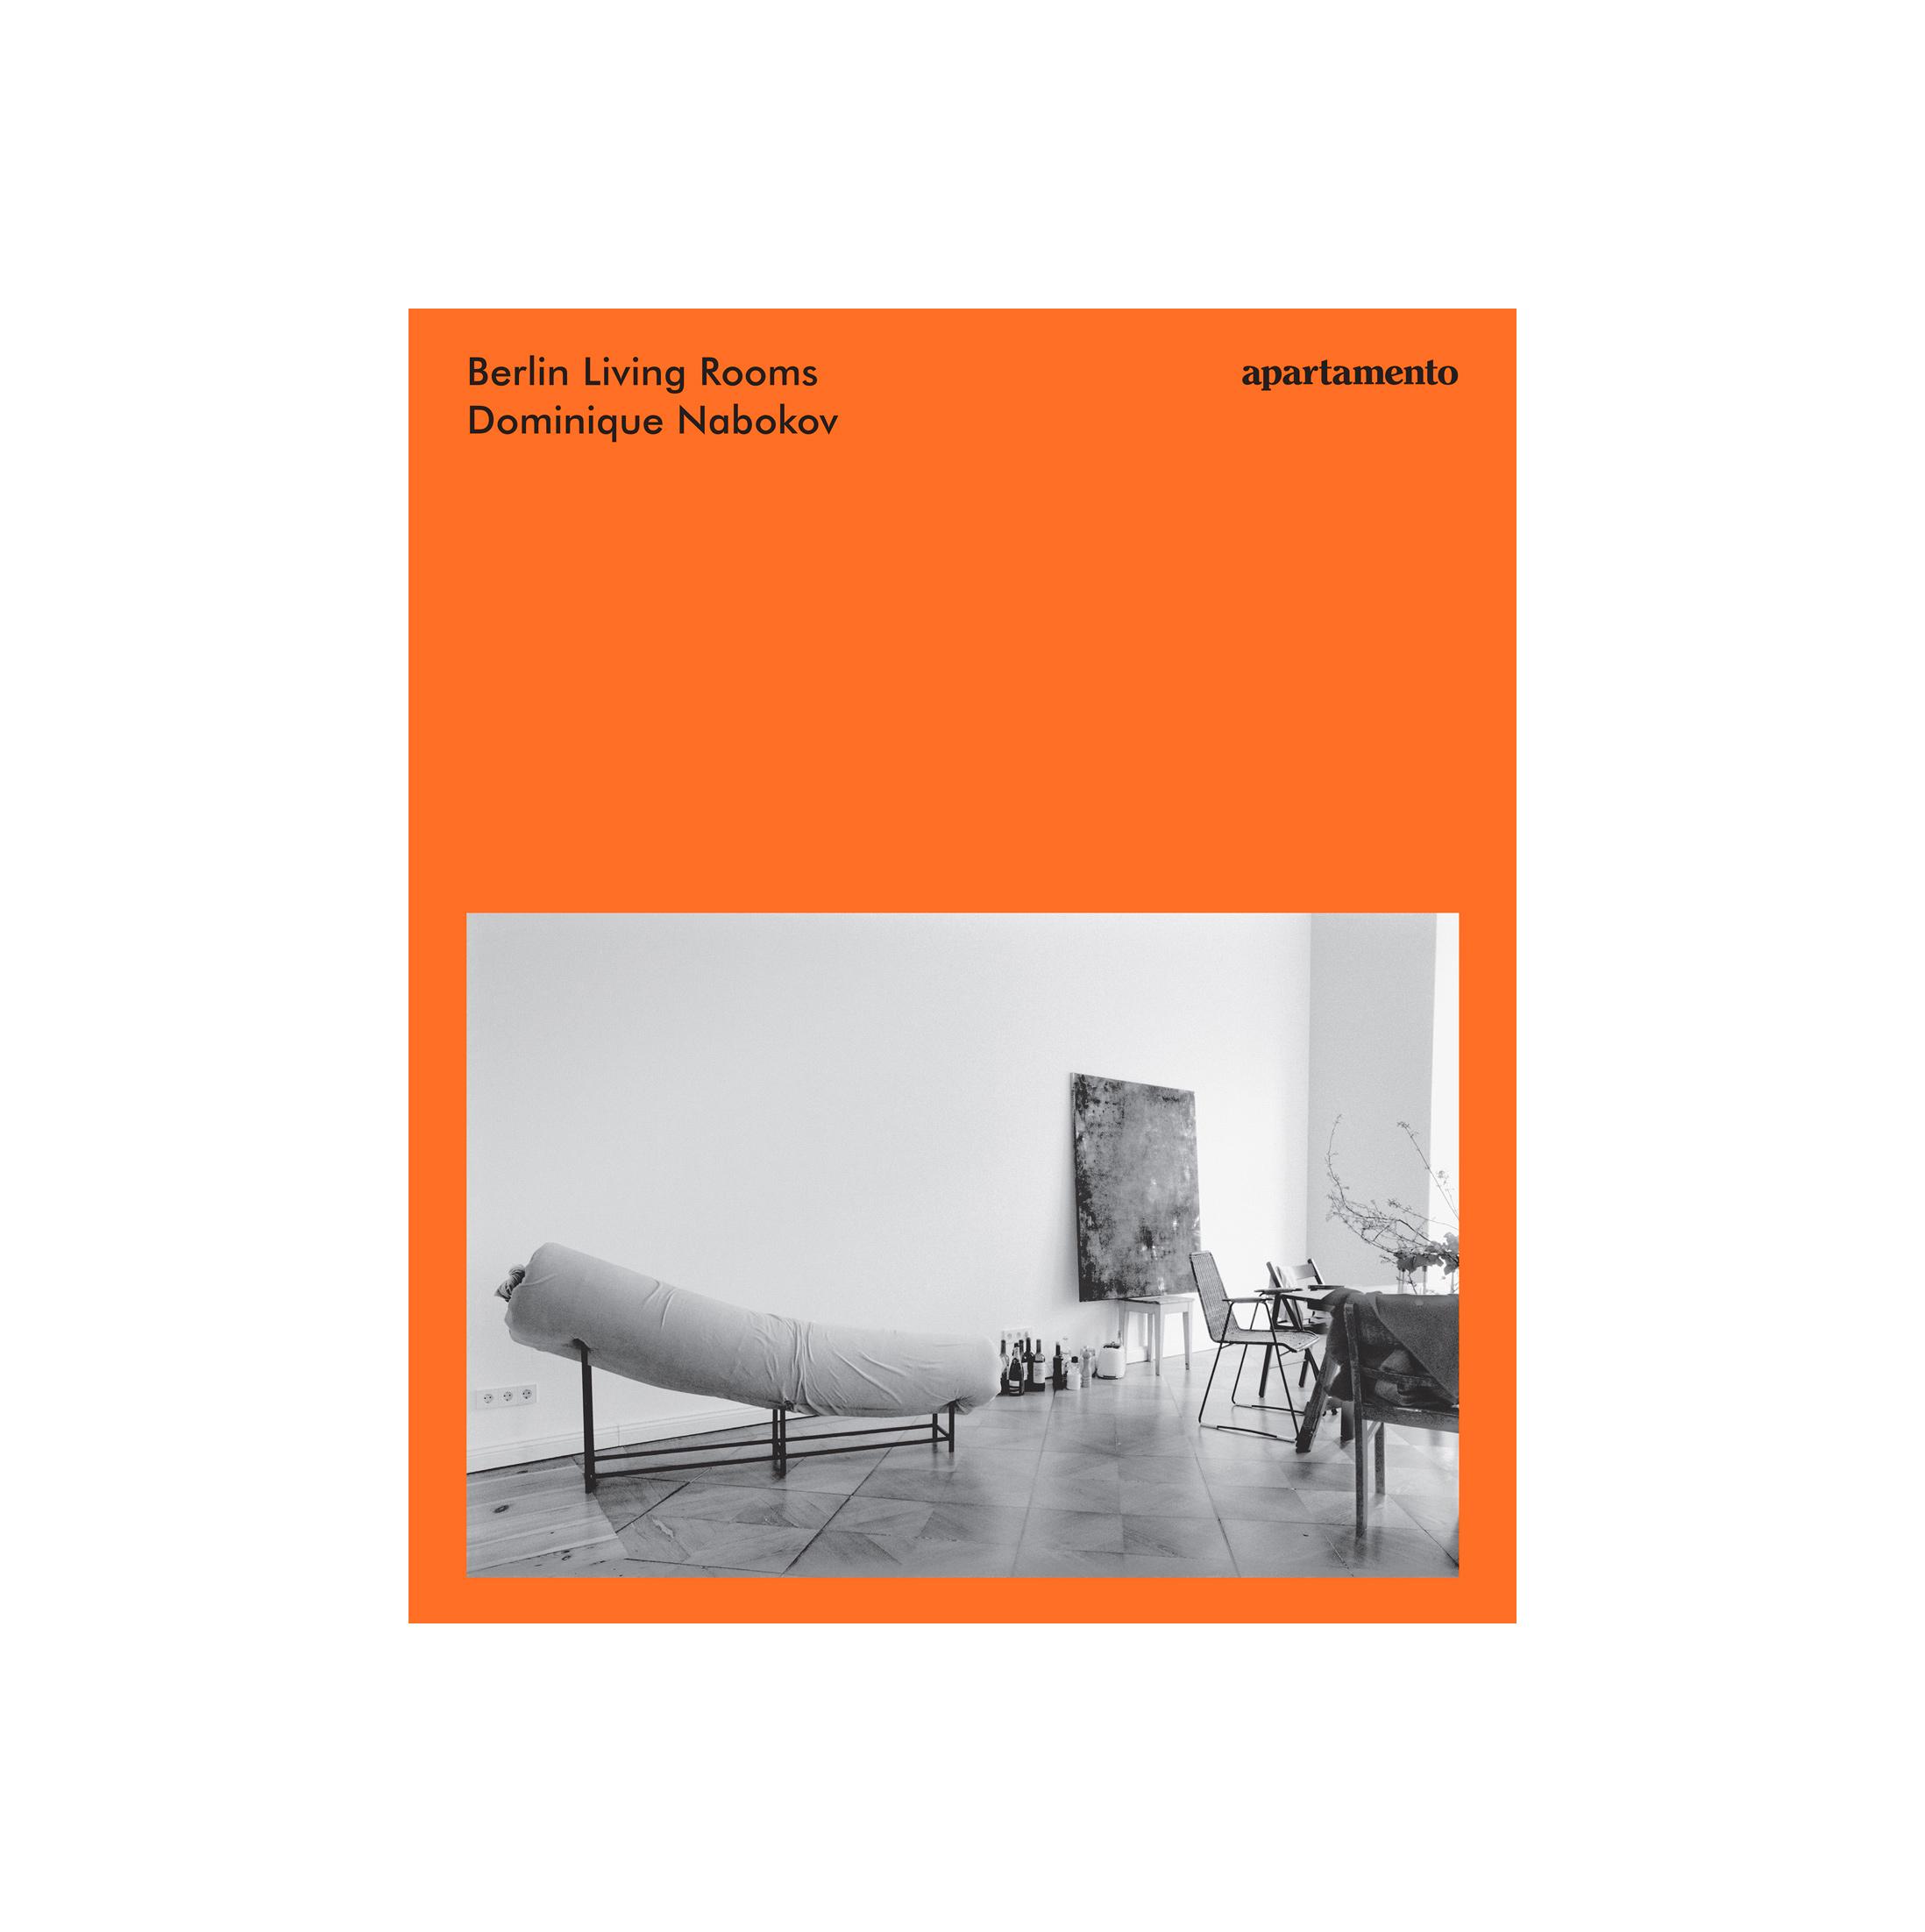 Apartemento Berlin Living Rooms - Dominique Nabokov (2nd edition)